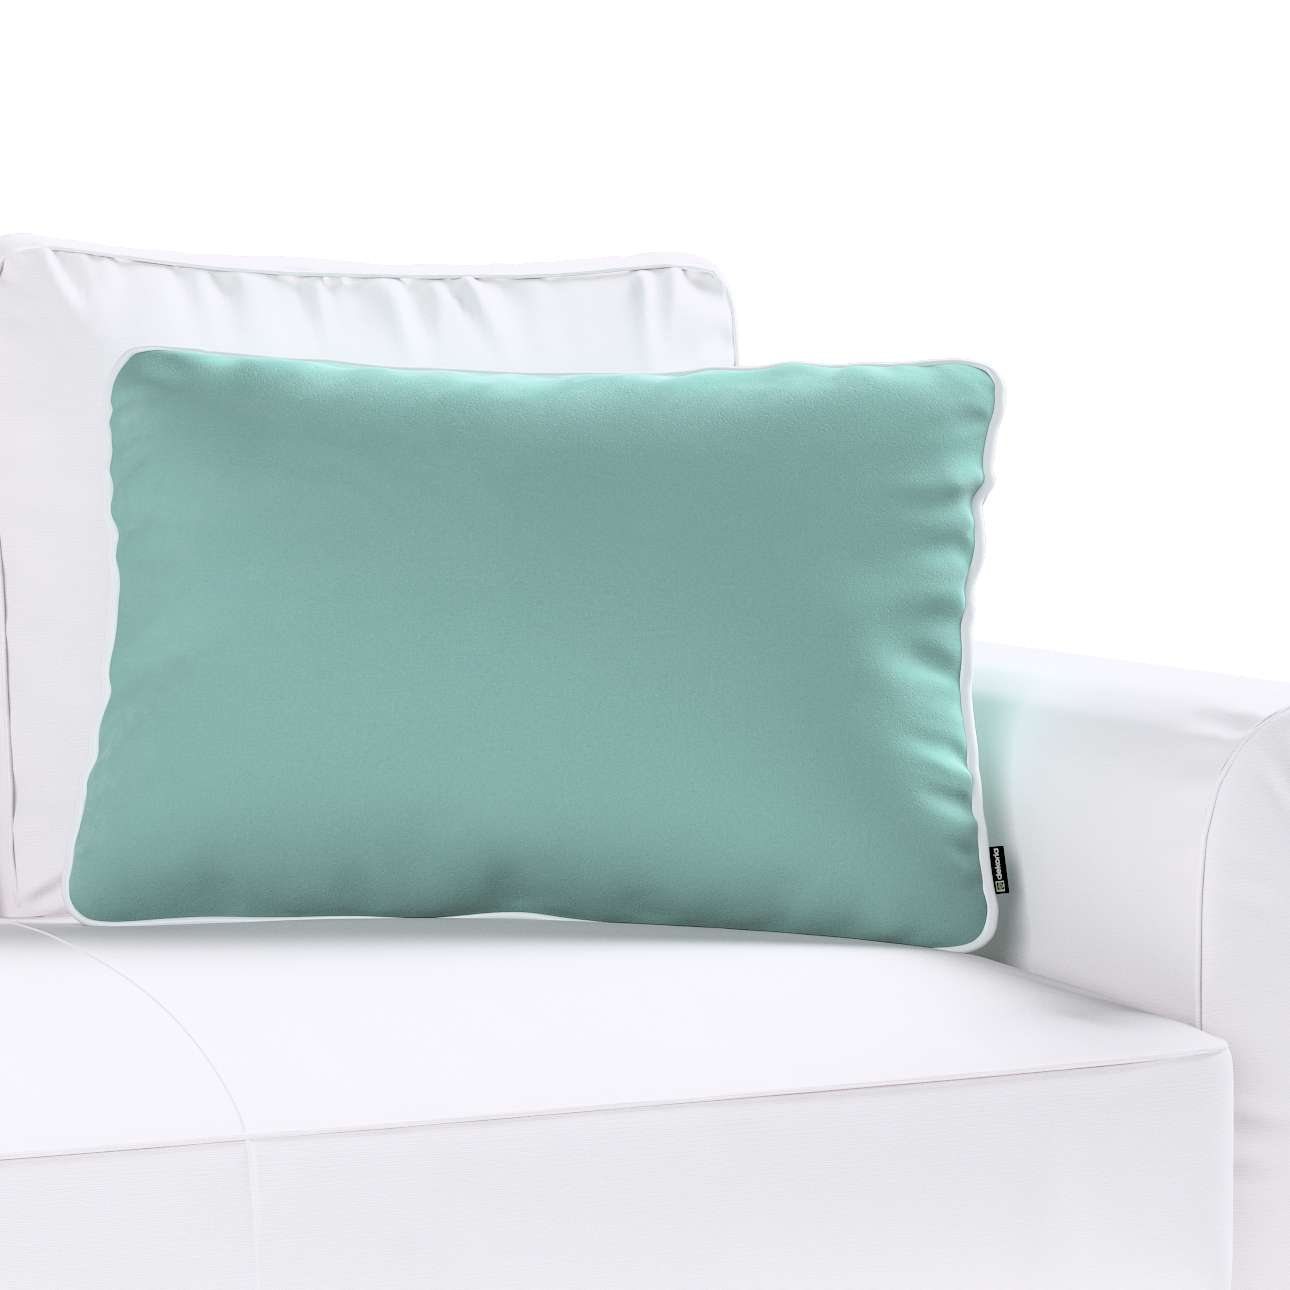 Poszewka Laura na poduszkę prostokątna w kolekcji Velvet, tkanina: 704-18